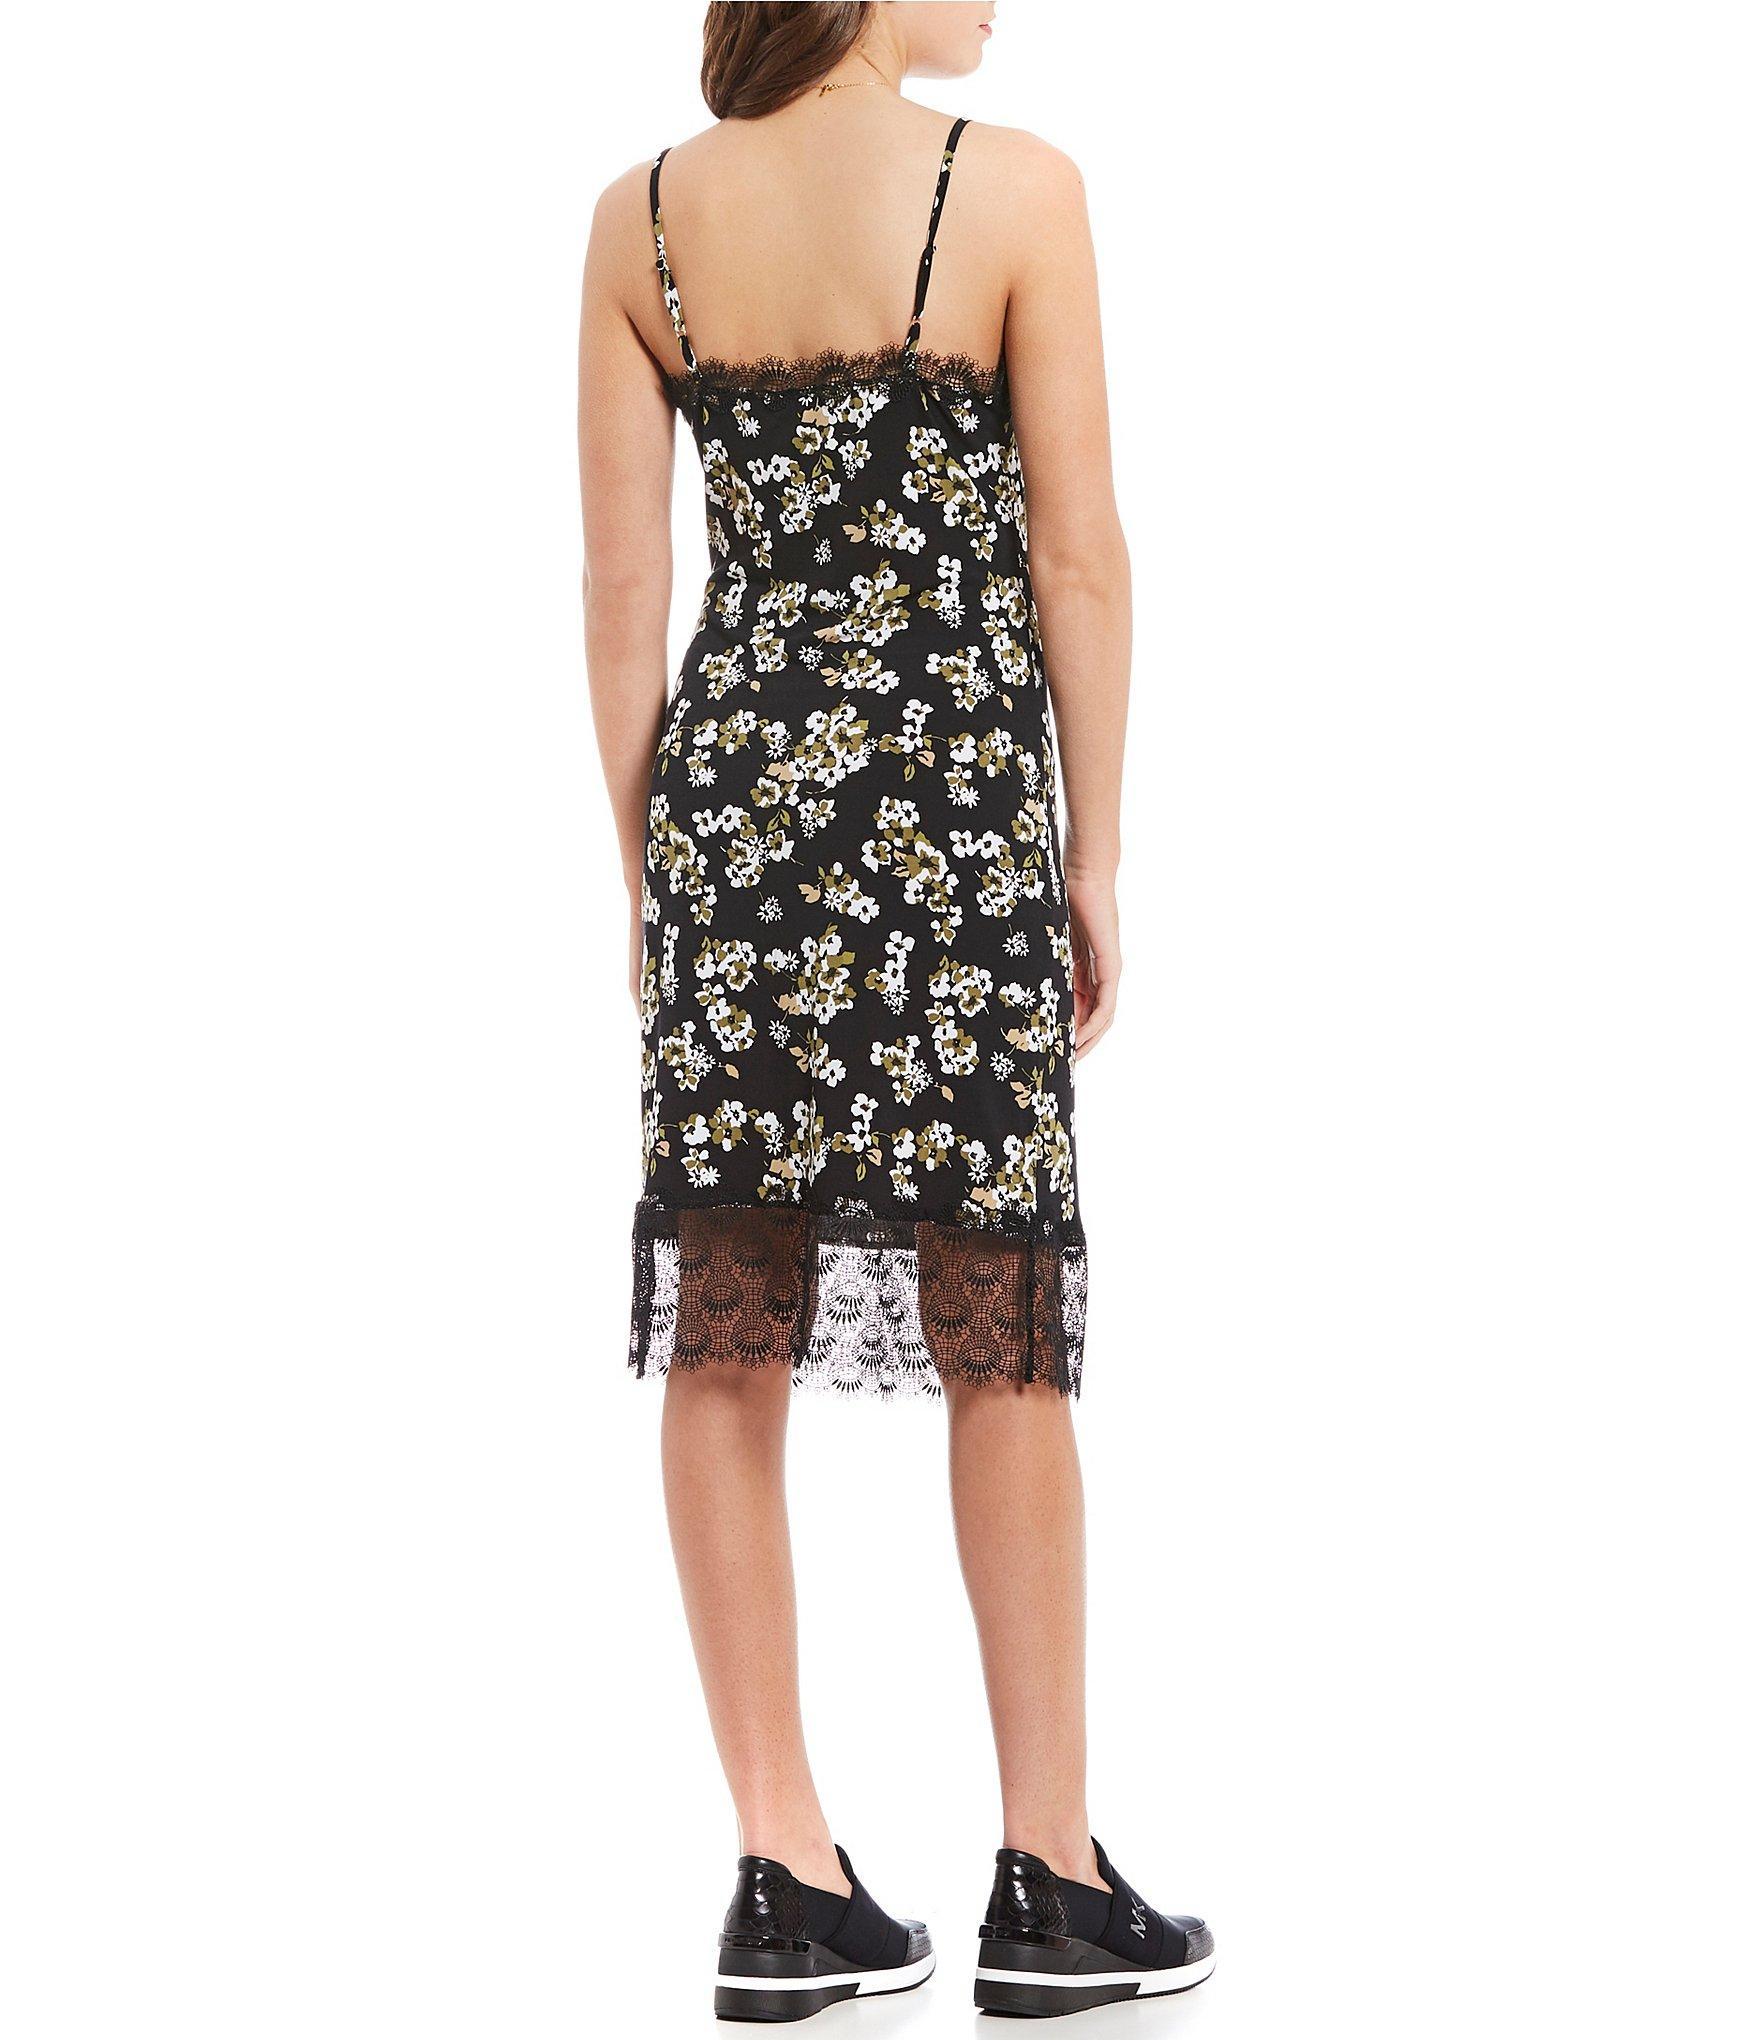 dd86366aada9 Lyst - MICHAEL Michael Kors Glam Painterly Fleur Floral Print Lace ...